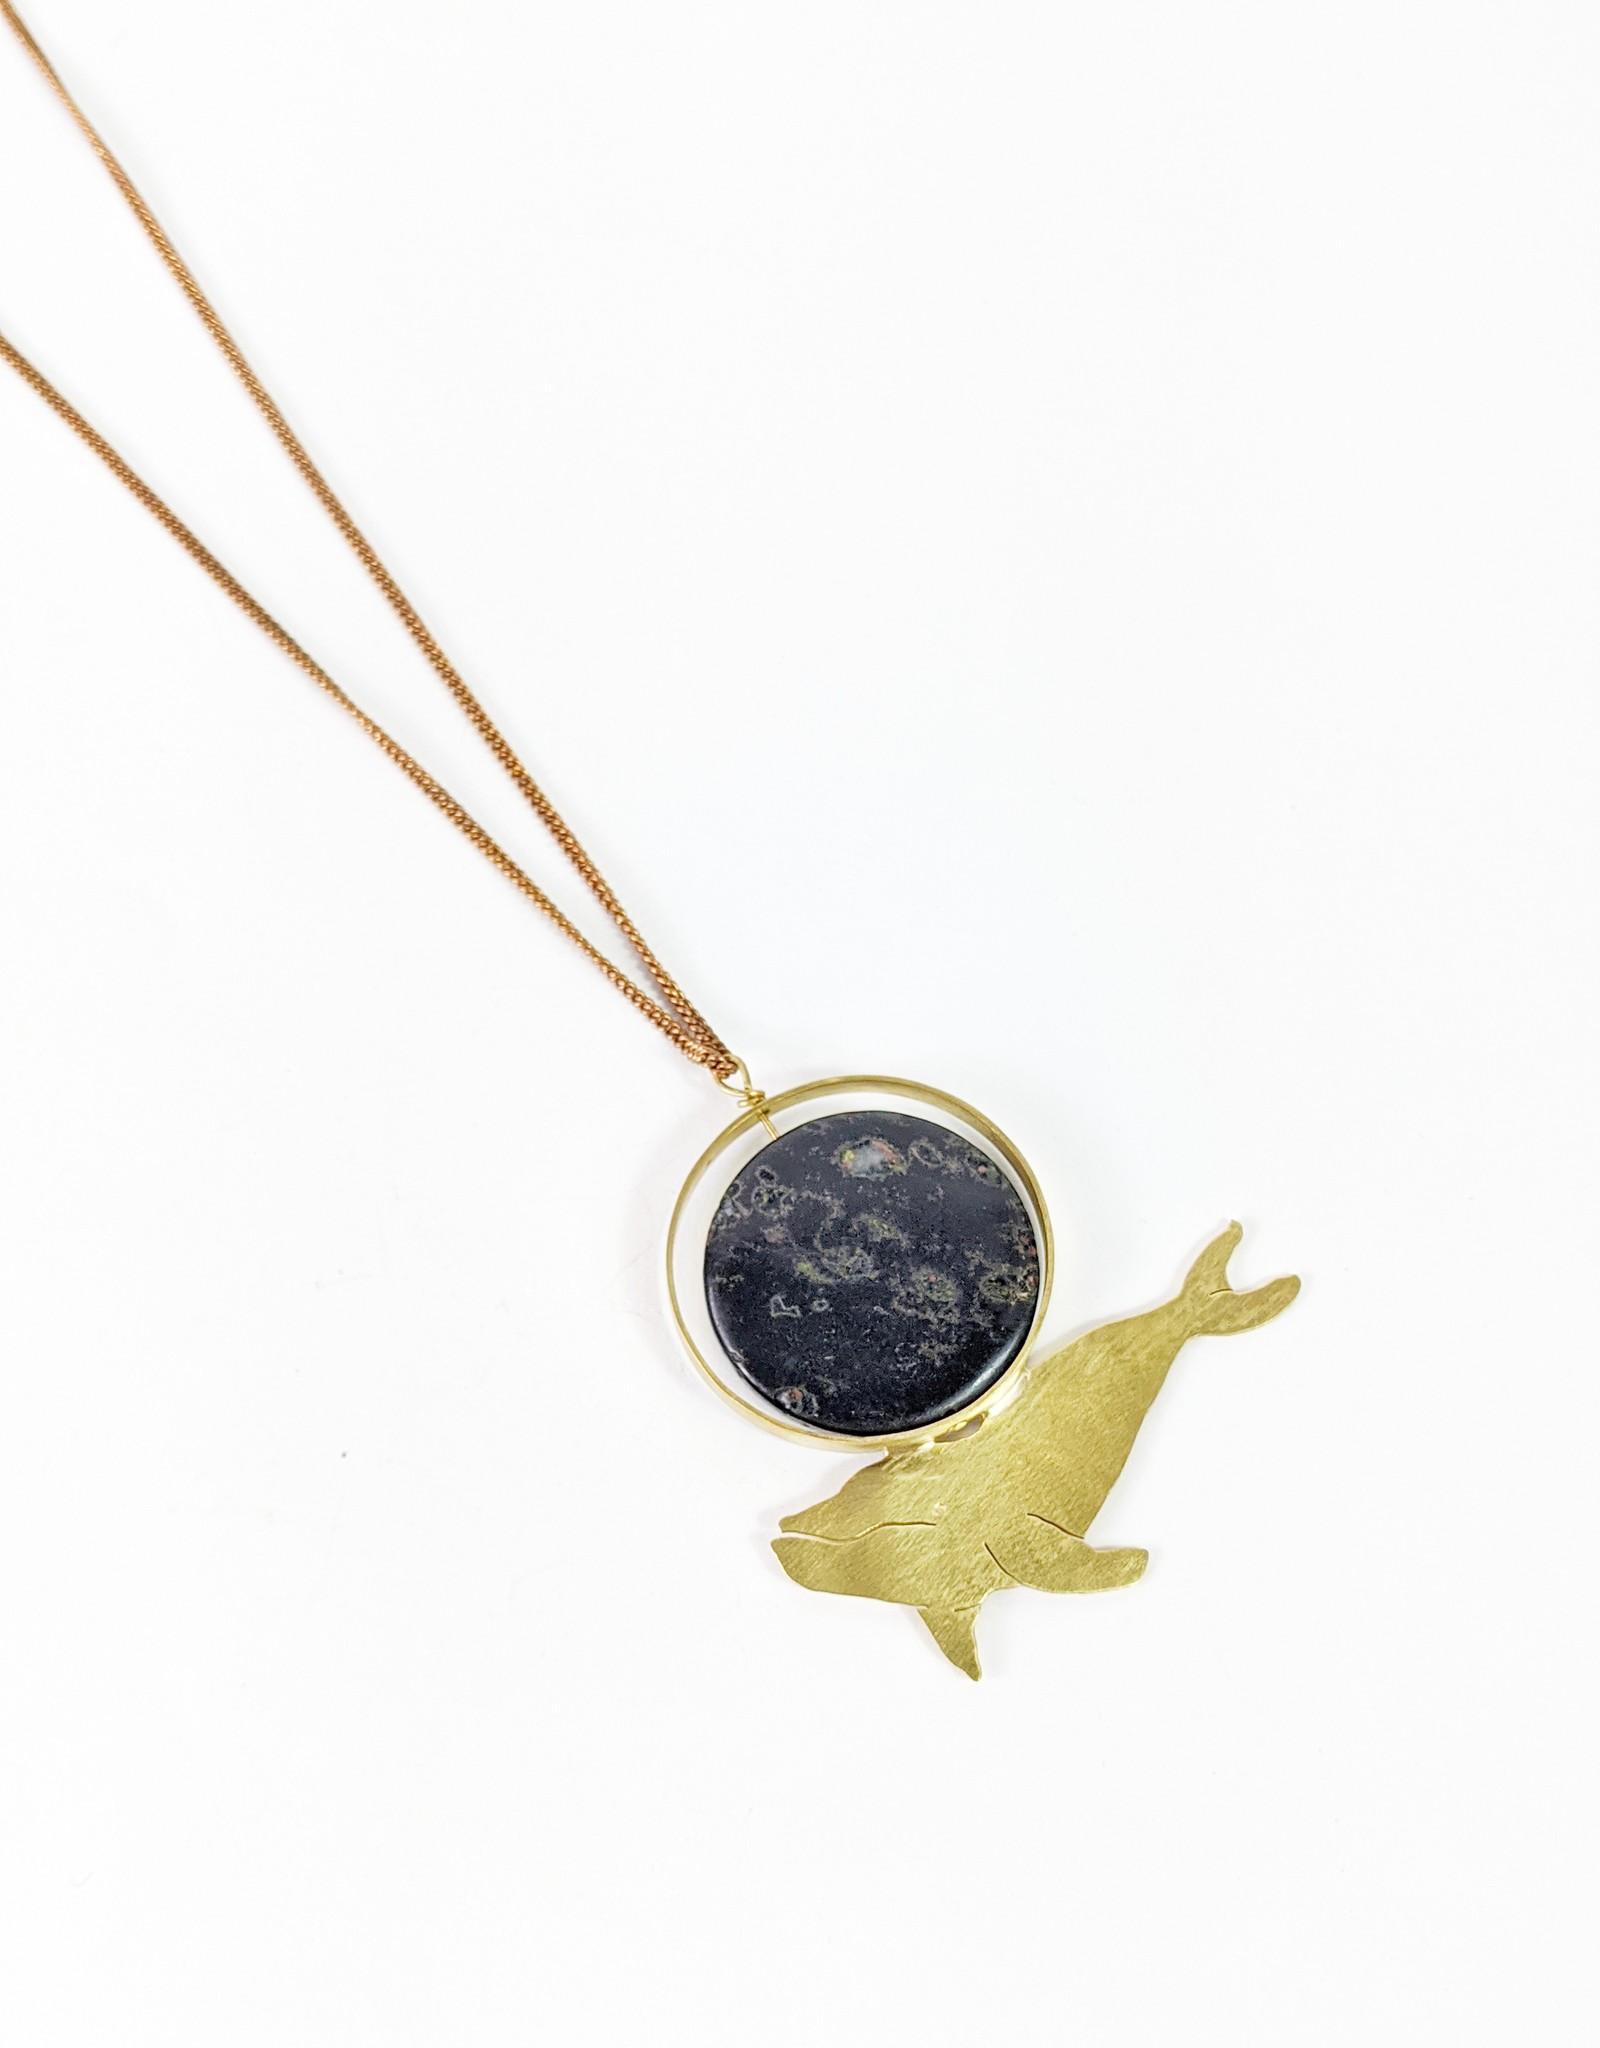 Serpentine Whale Necklace